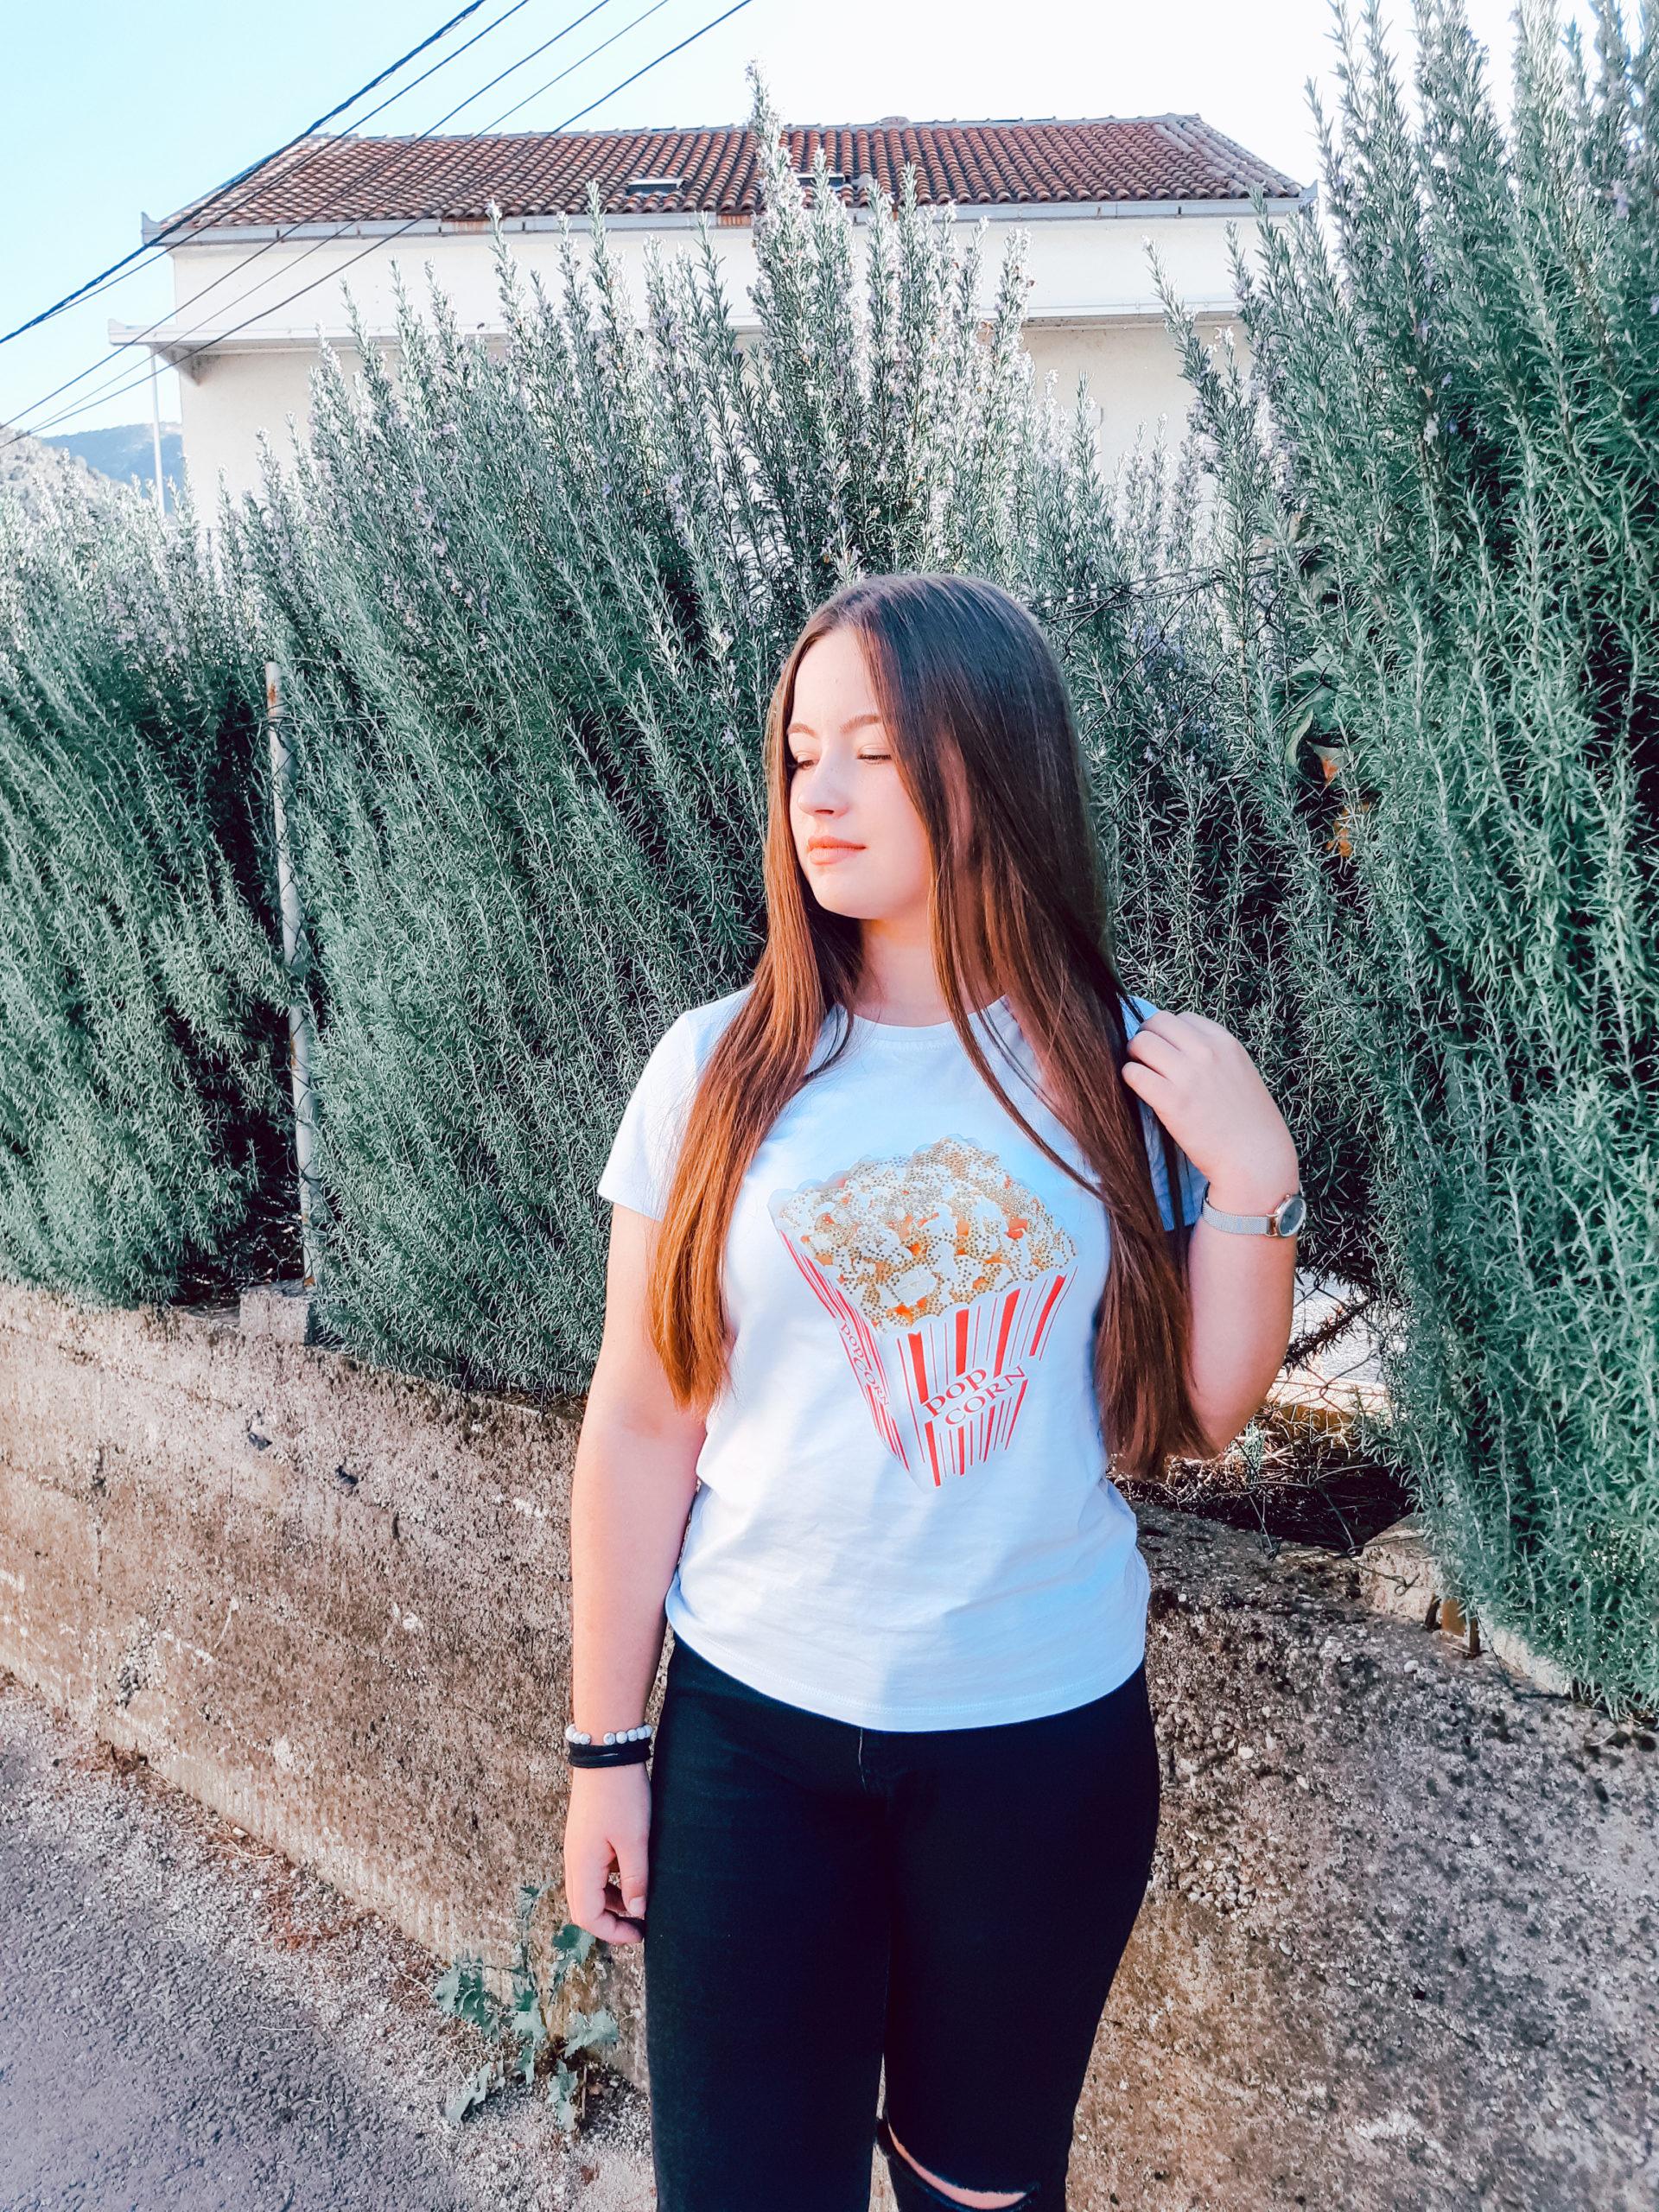 sanammos movie night popcorn t-shirt tee review livinglikev fashion blogger living like v style blogger